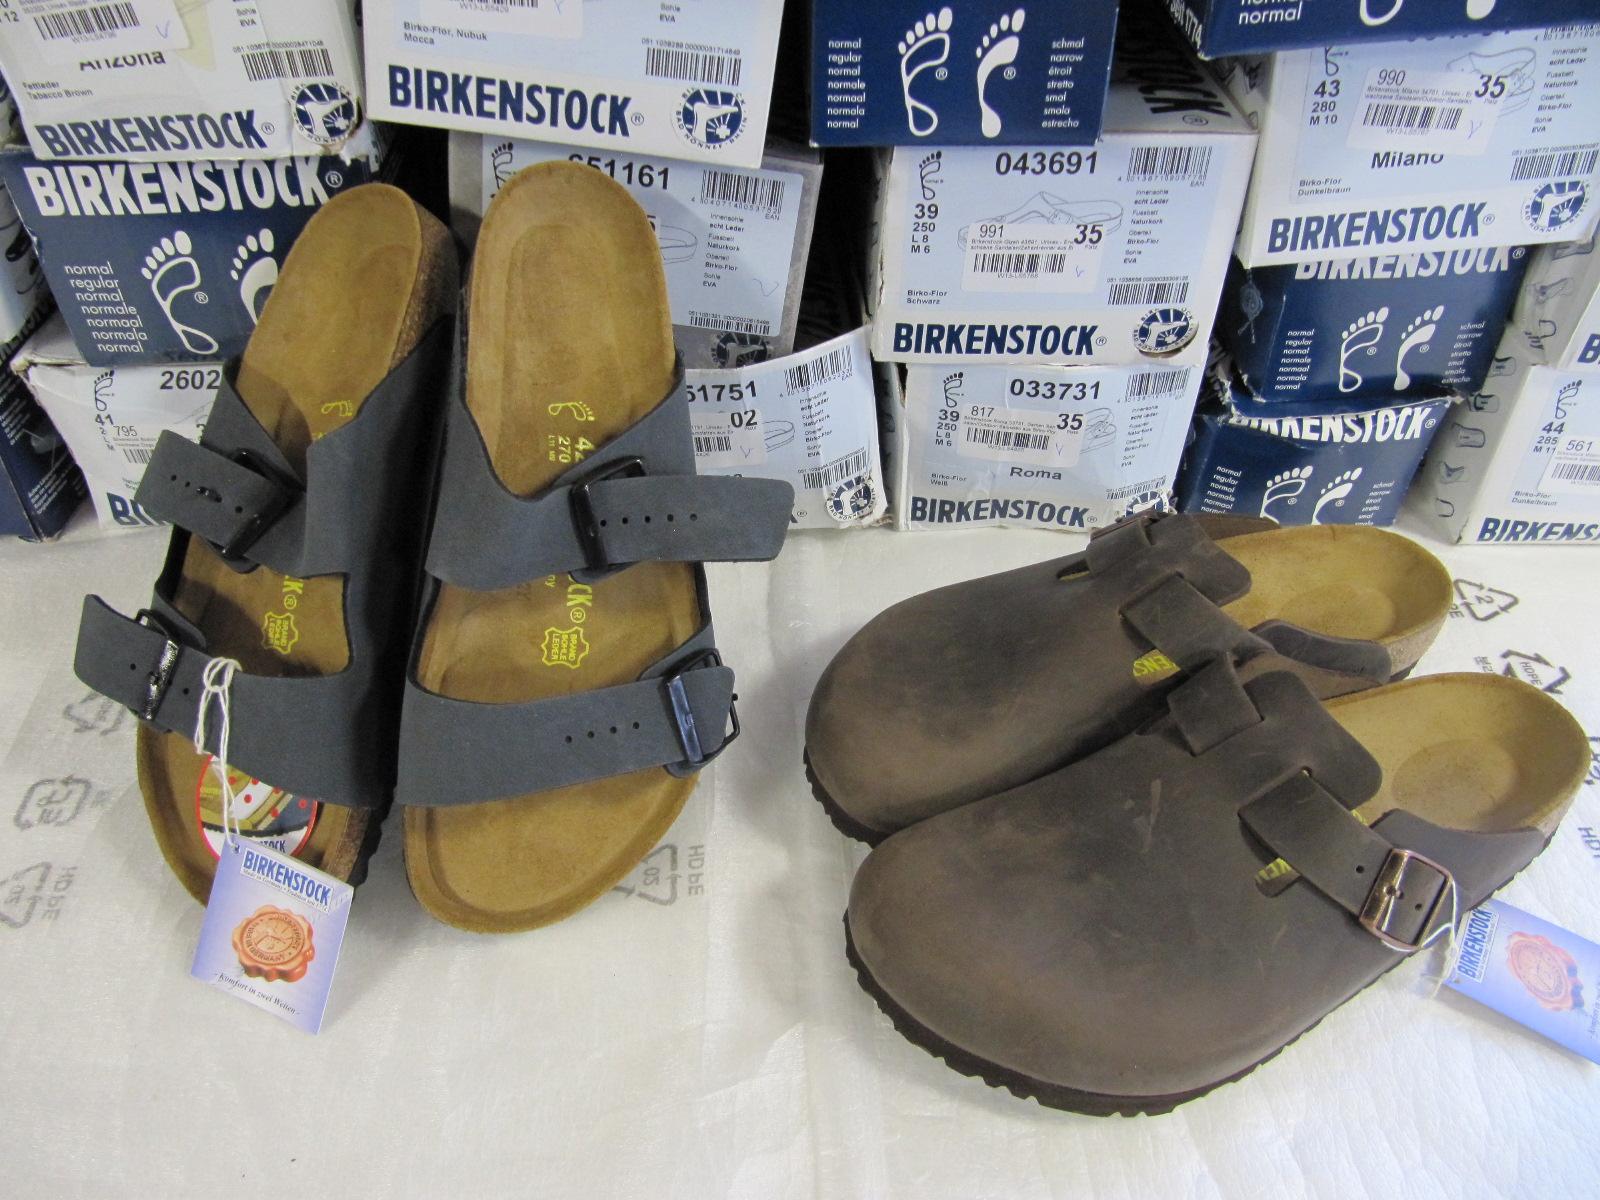 birkenstock restposten 39x hausschuhe sandalen schuhe h ndler rechnung 3072 ebay. Black Bedroom Furniture Sets. Home Design Ideas